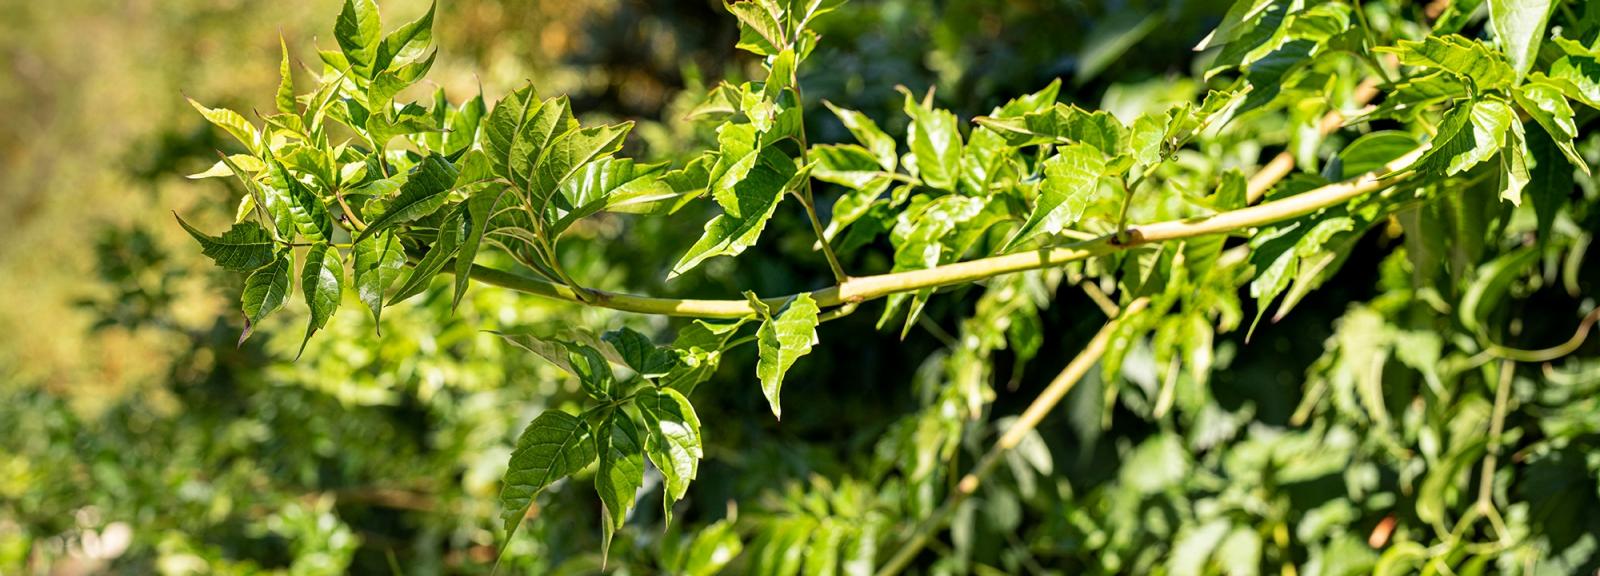 Bignone de Virginie (Campsis radicans) - Jardin botanique Val Rahmeh-Menton © MNHN - Agnès Iatzoura